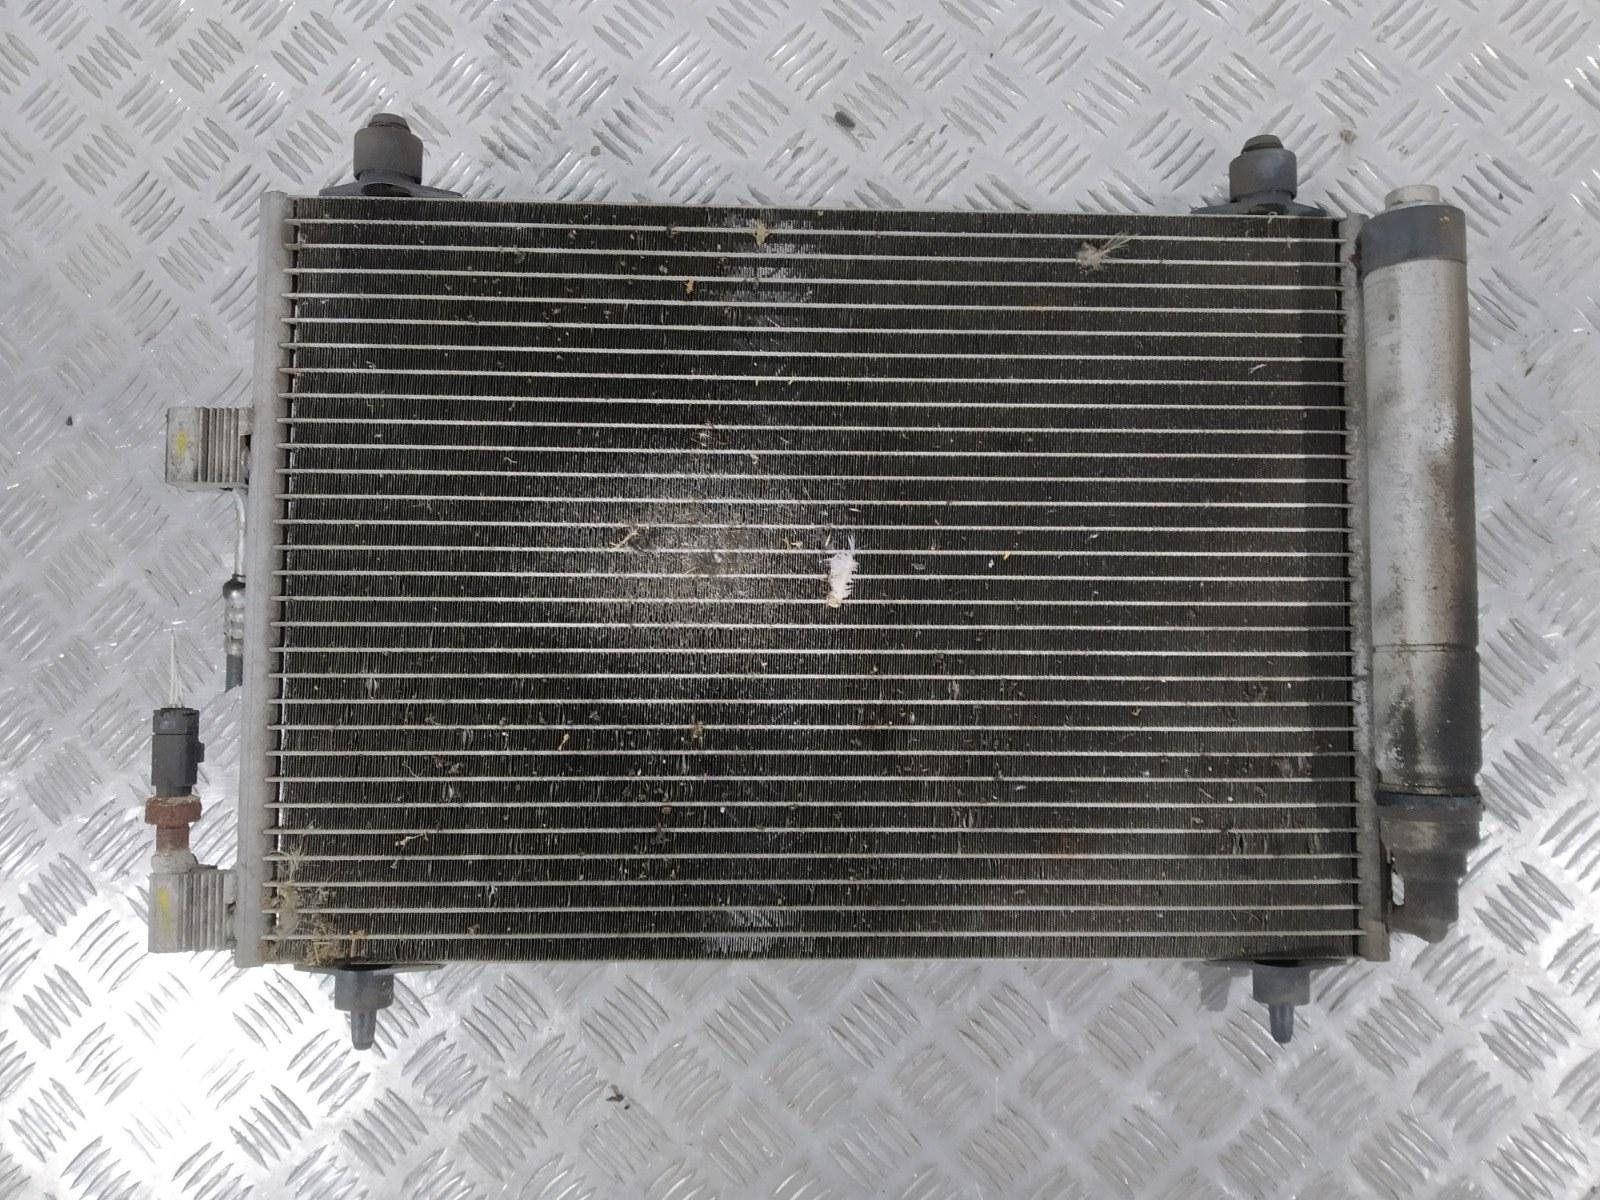 Радиатор кондиционера Citroen C5 2.2 HDI 2002 (б/у)